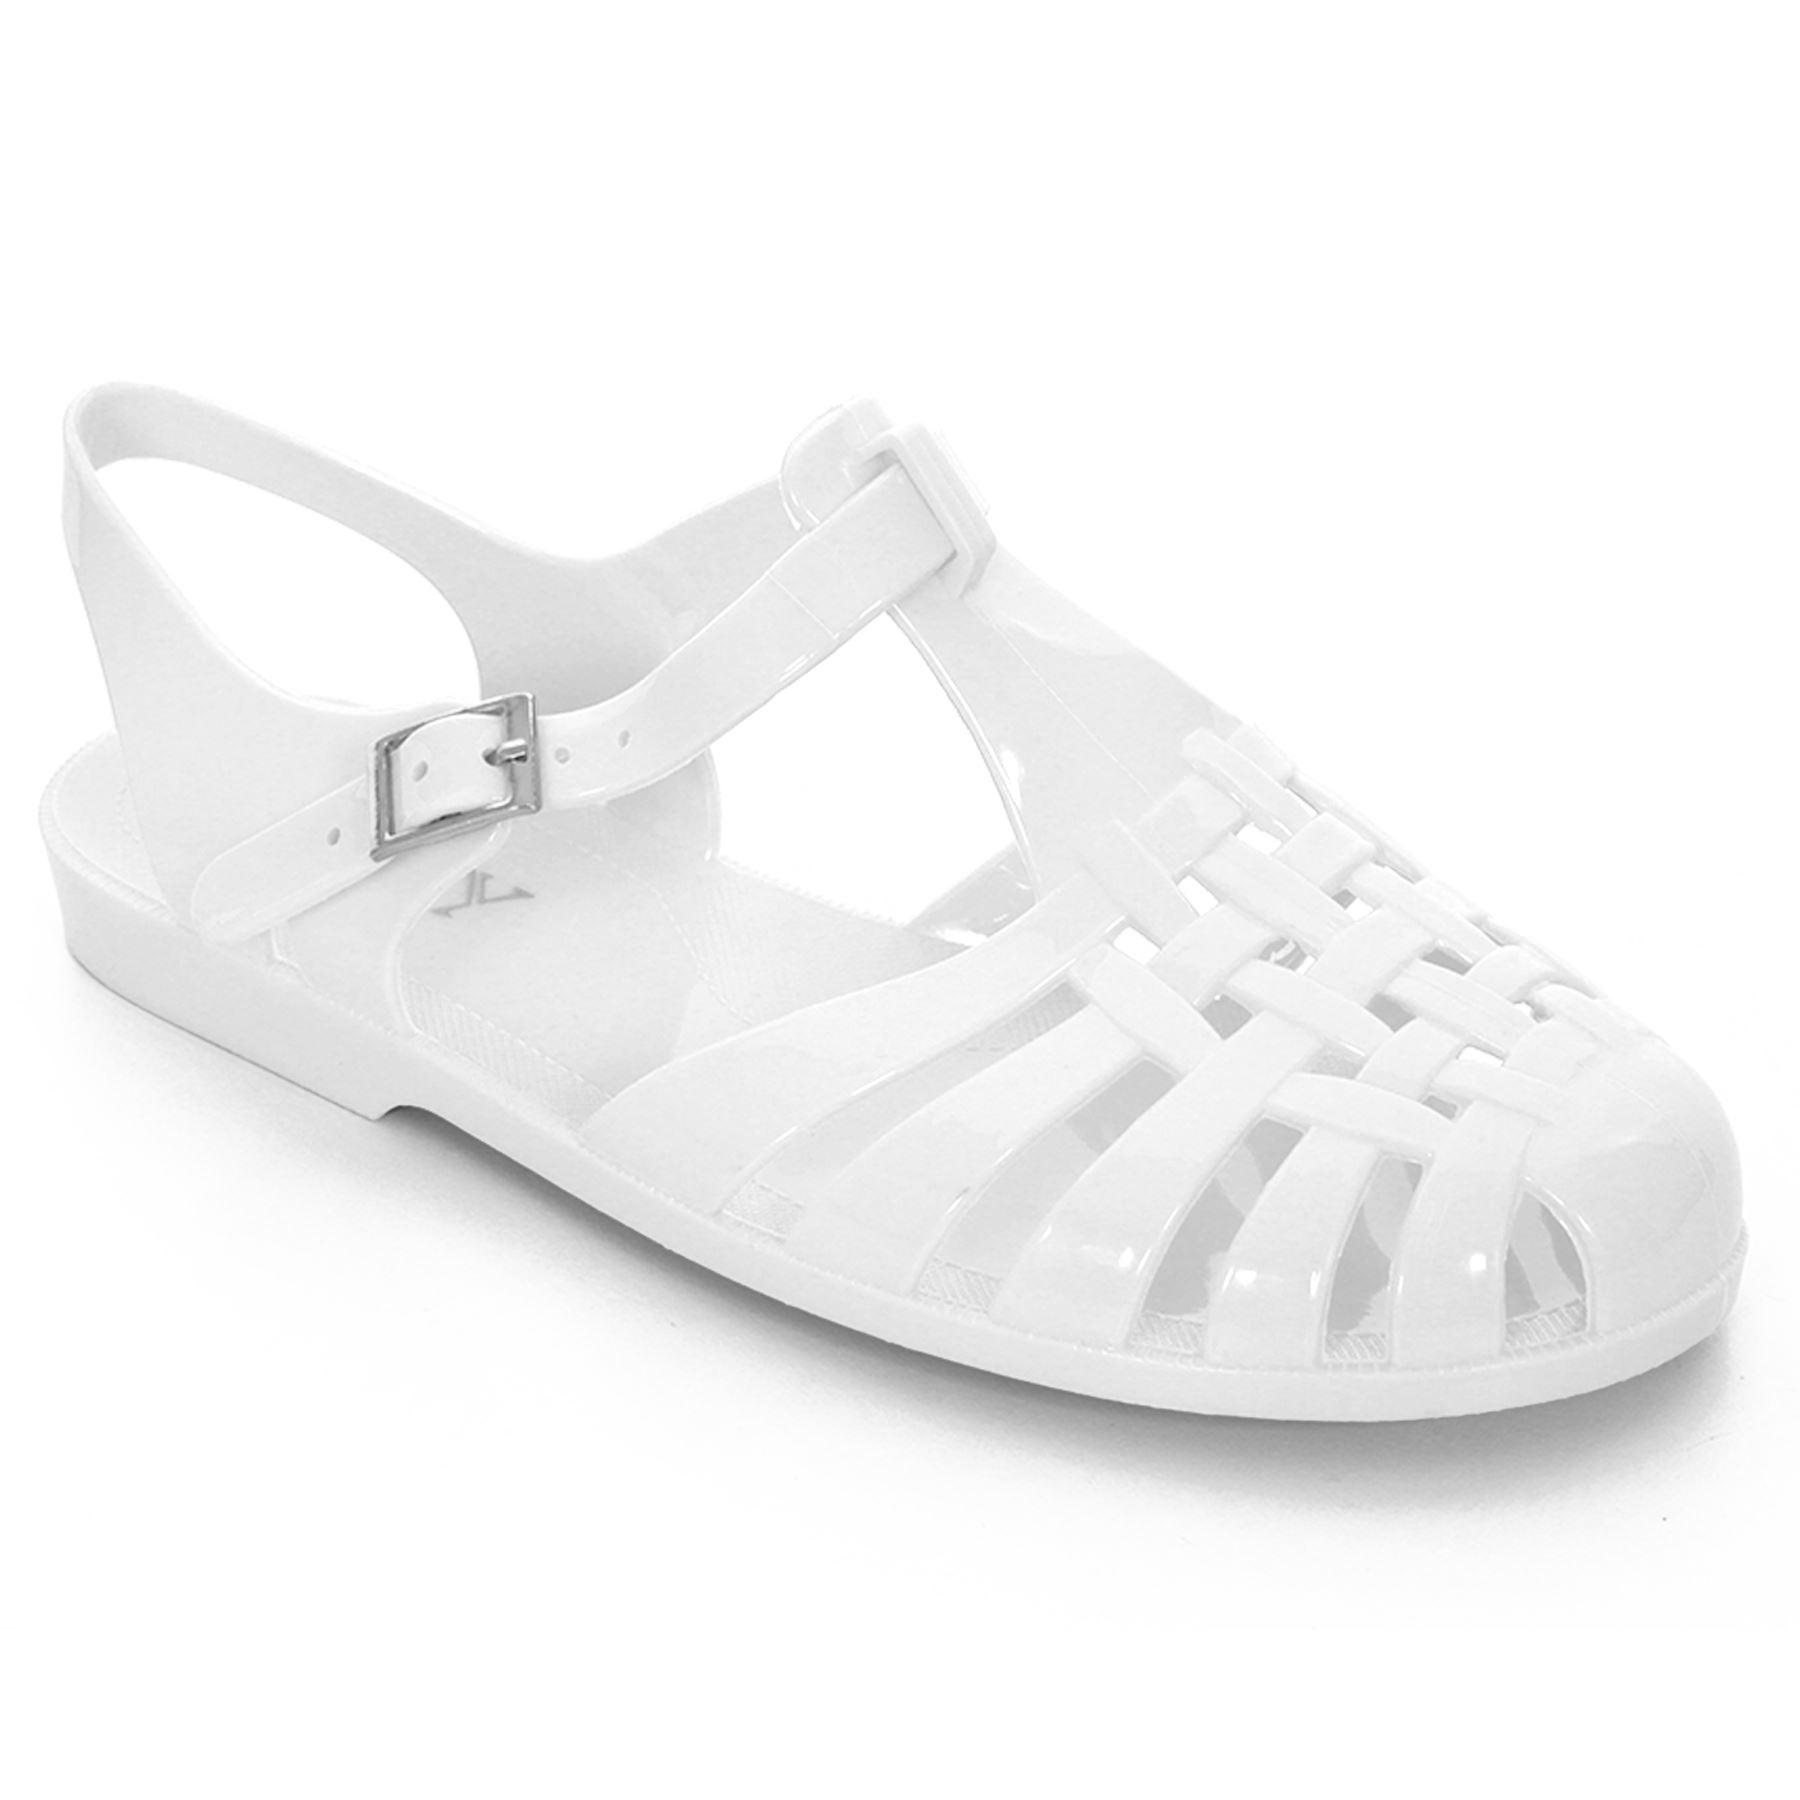 efbb04f3ecb5 Ladies Glitter Plain Beach Block Flat Heel Summer Flip Flop Jelly Sandals  Shoes